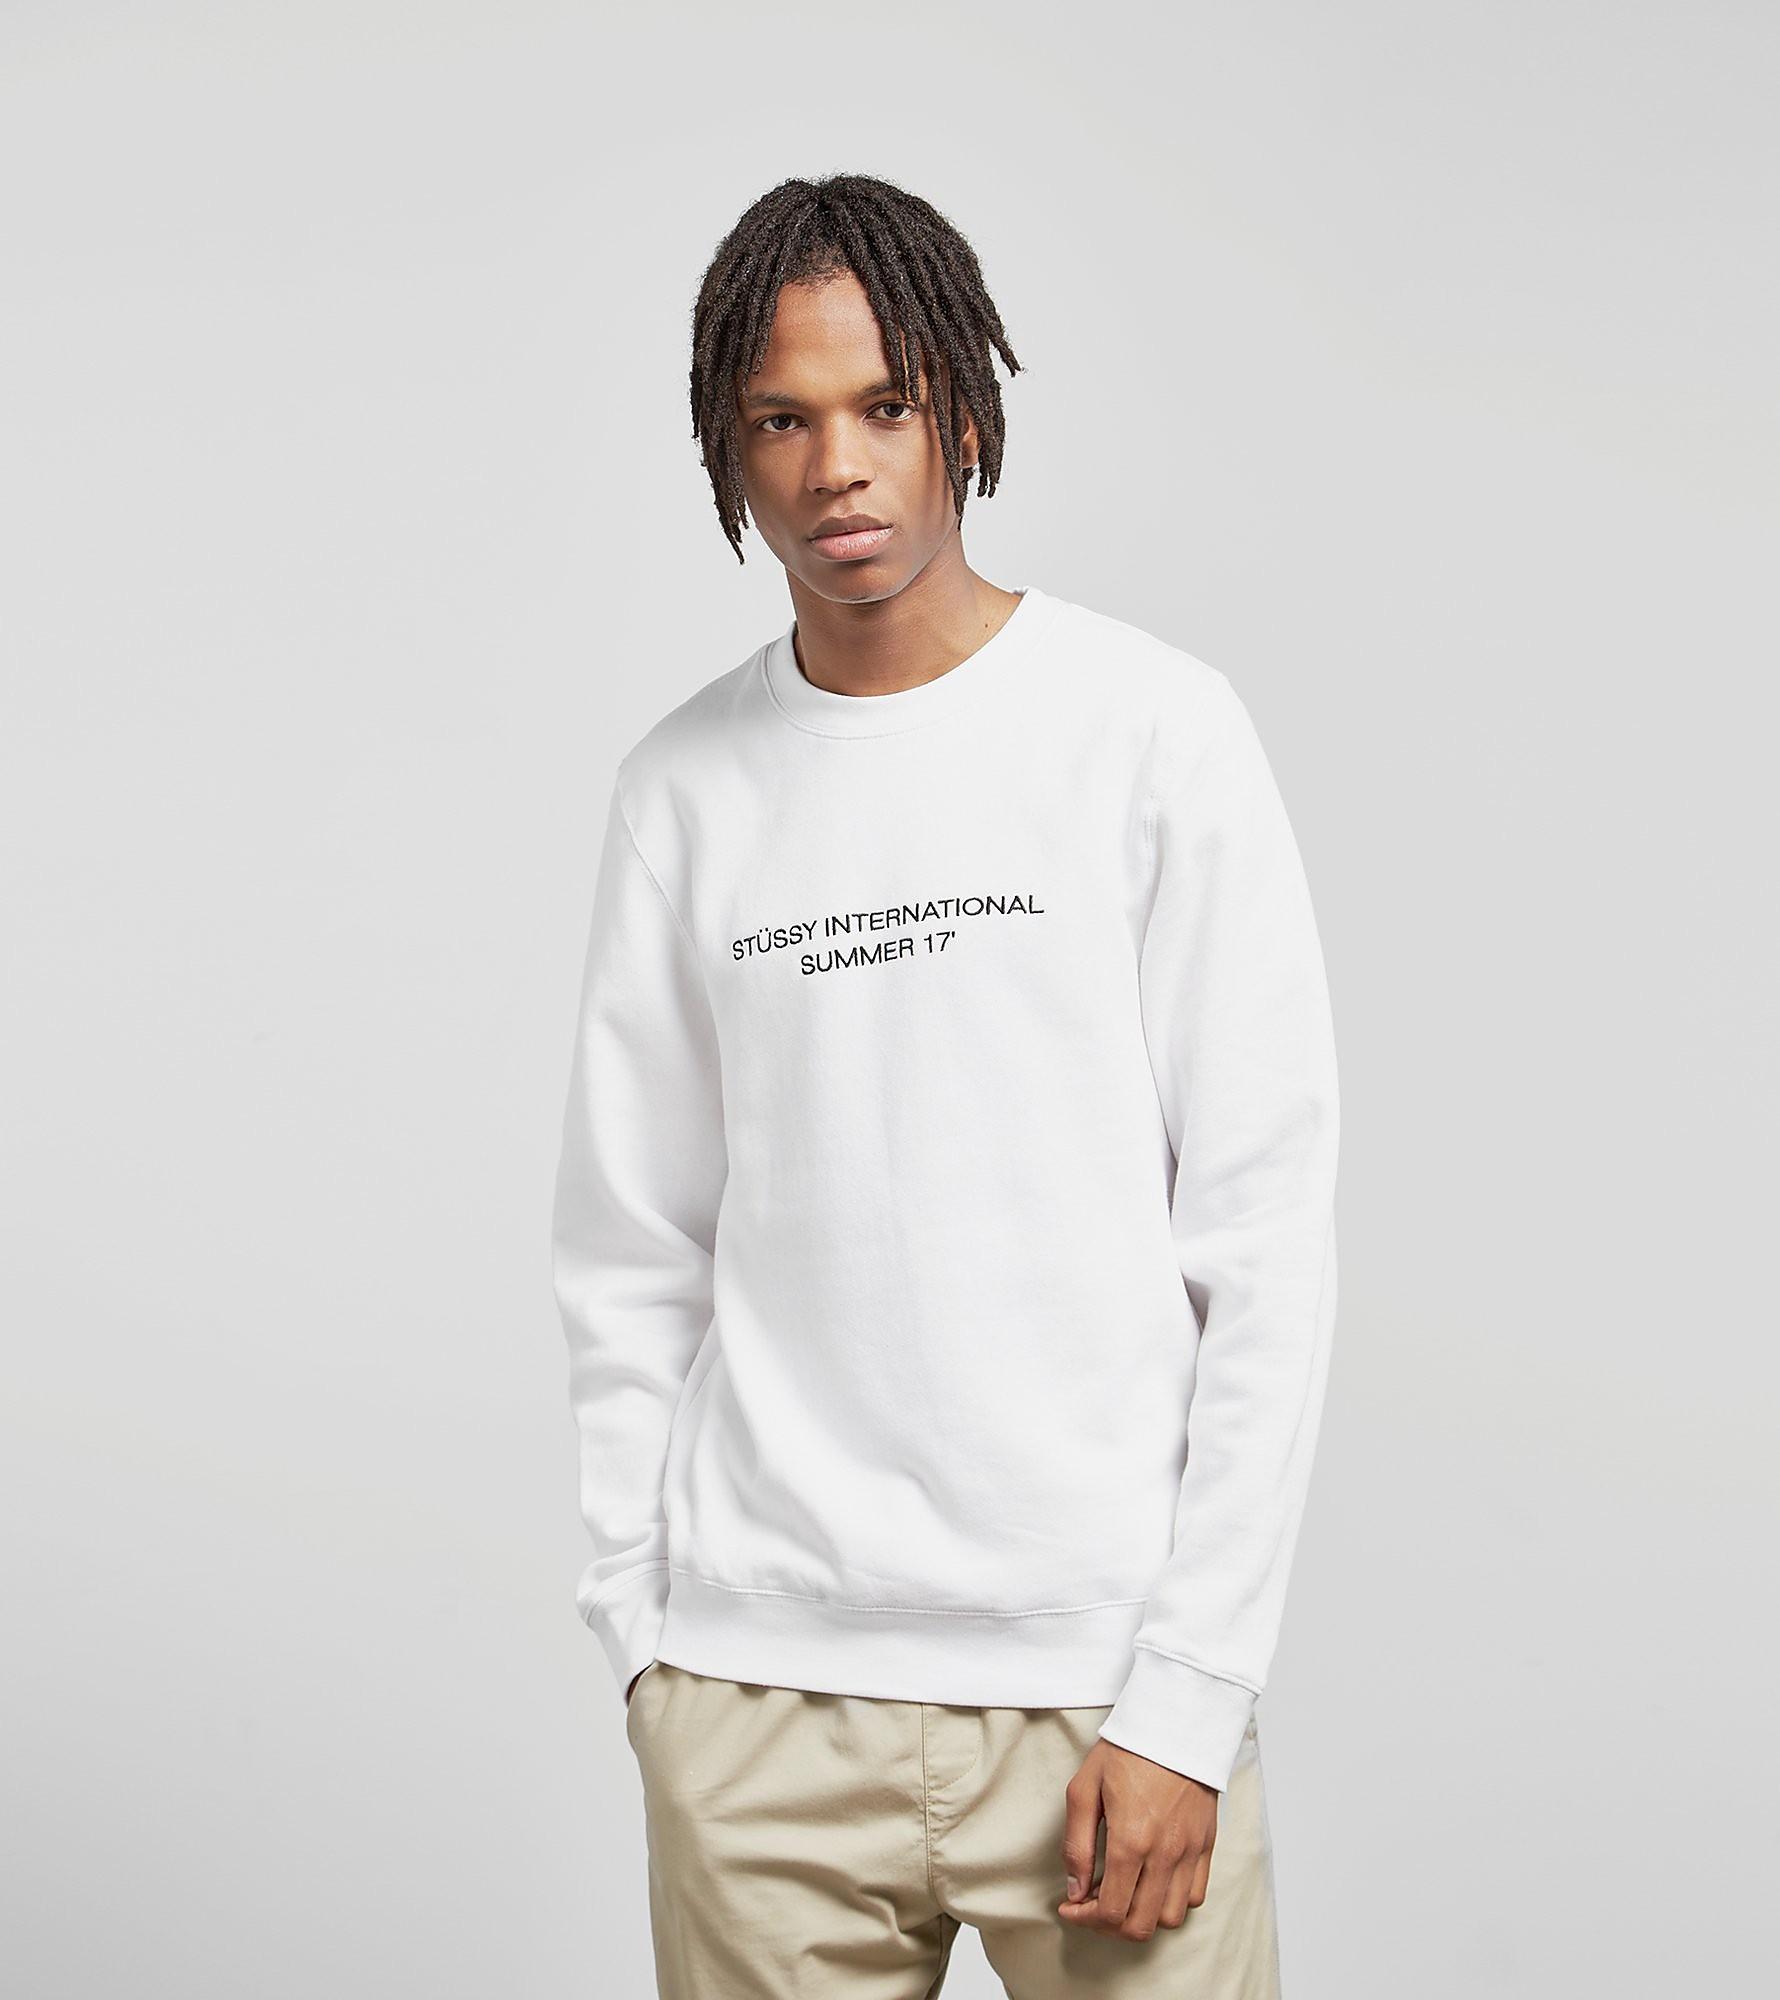 Stussy International Summer Crew Sweatshirt